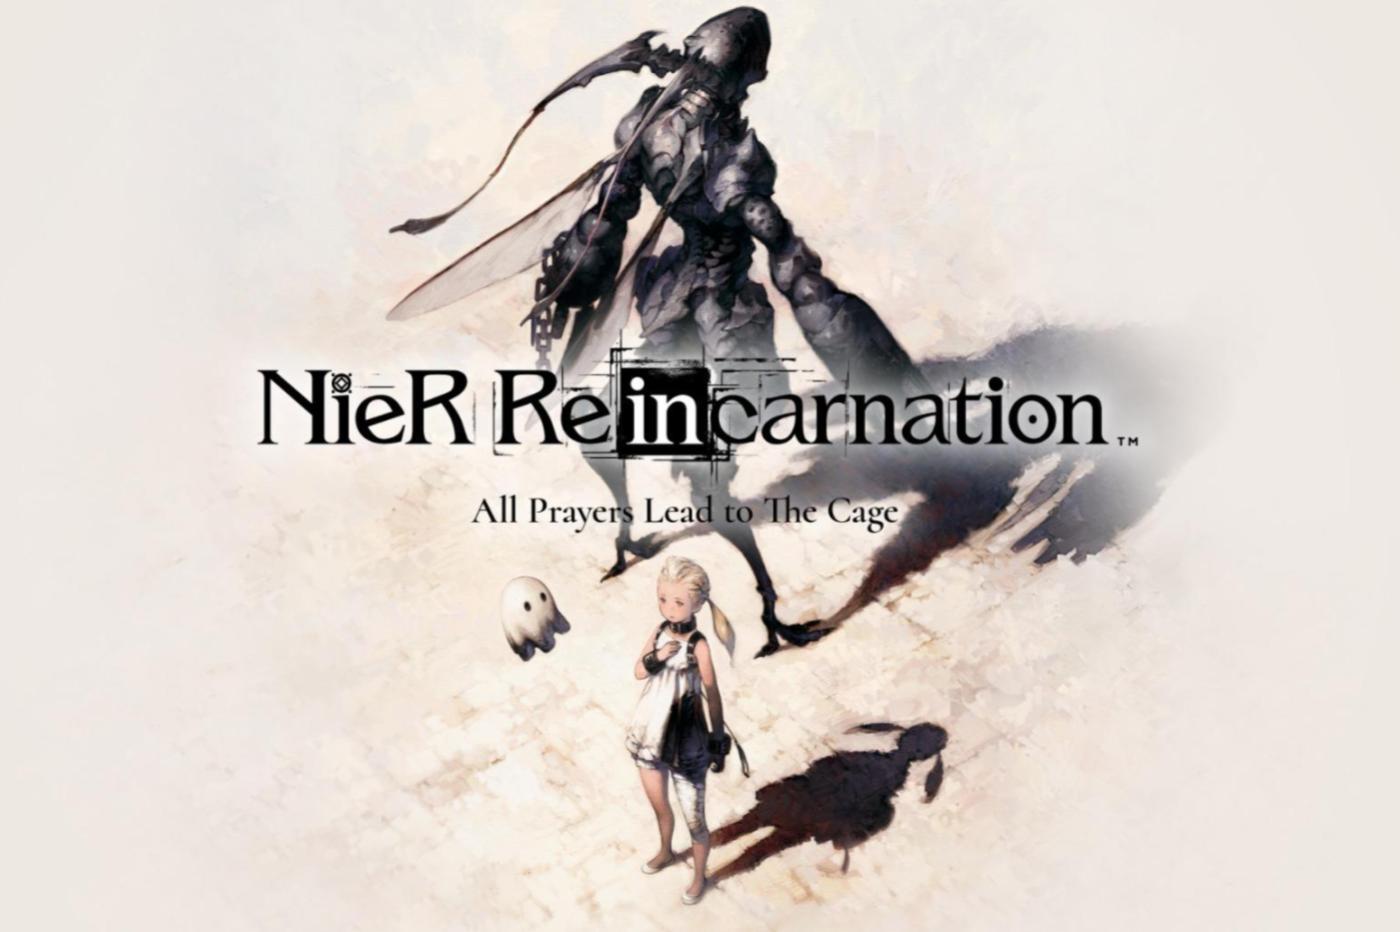 Nier Reincarnation Square Enix mobiles